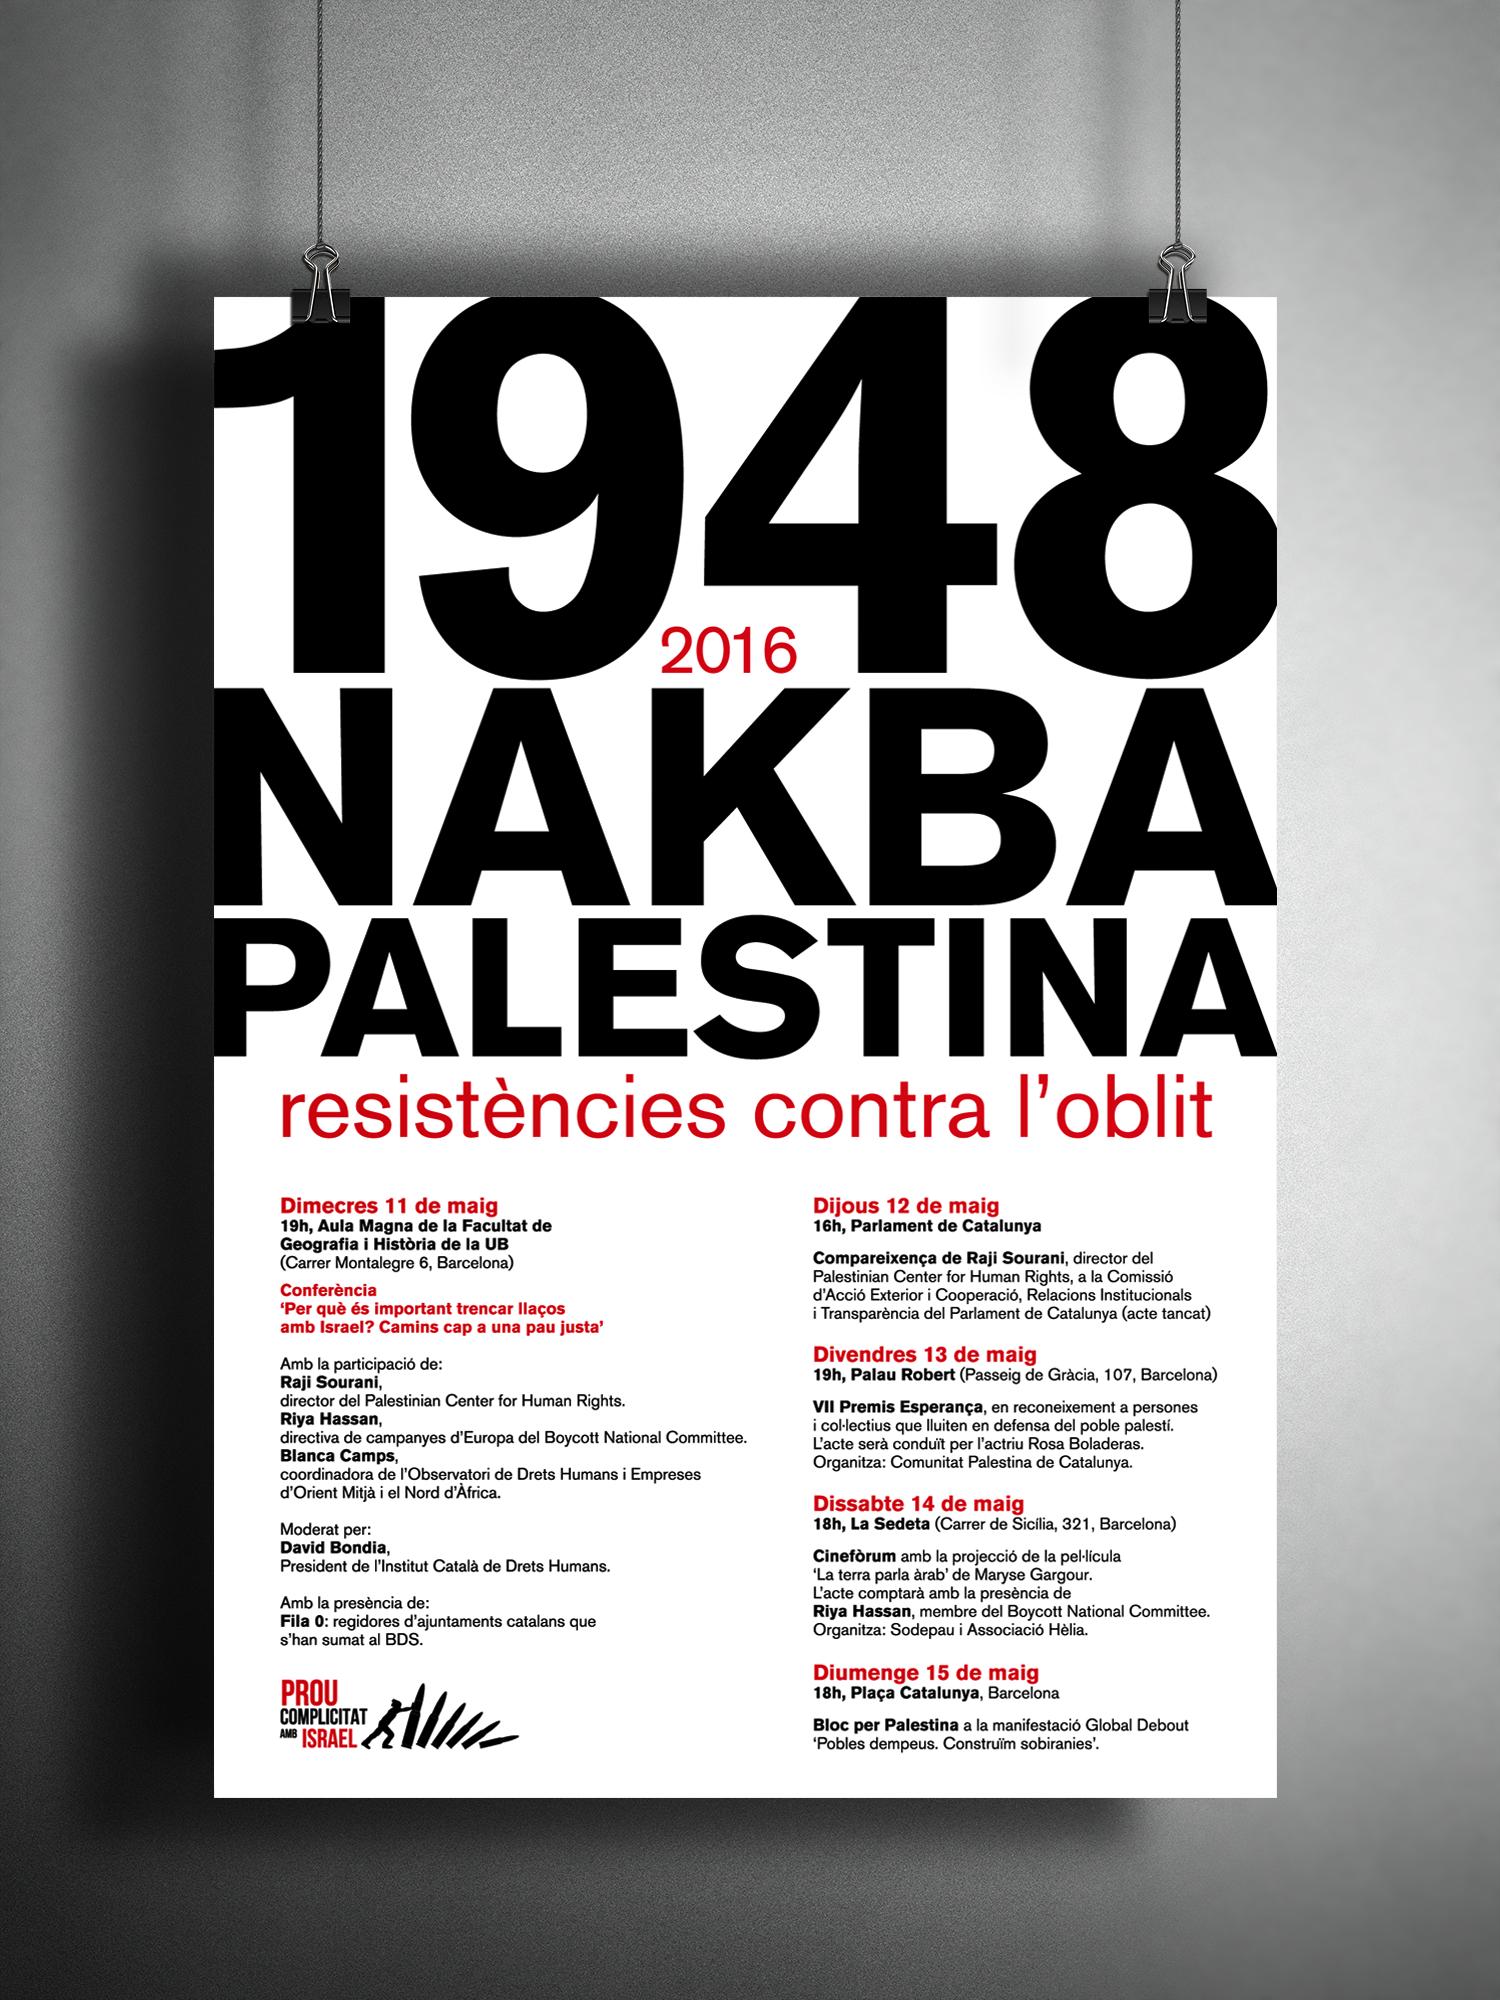 Nakba palestina 2016